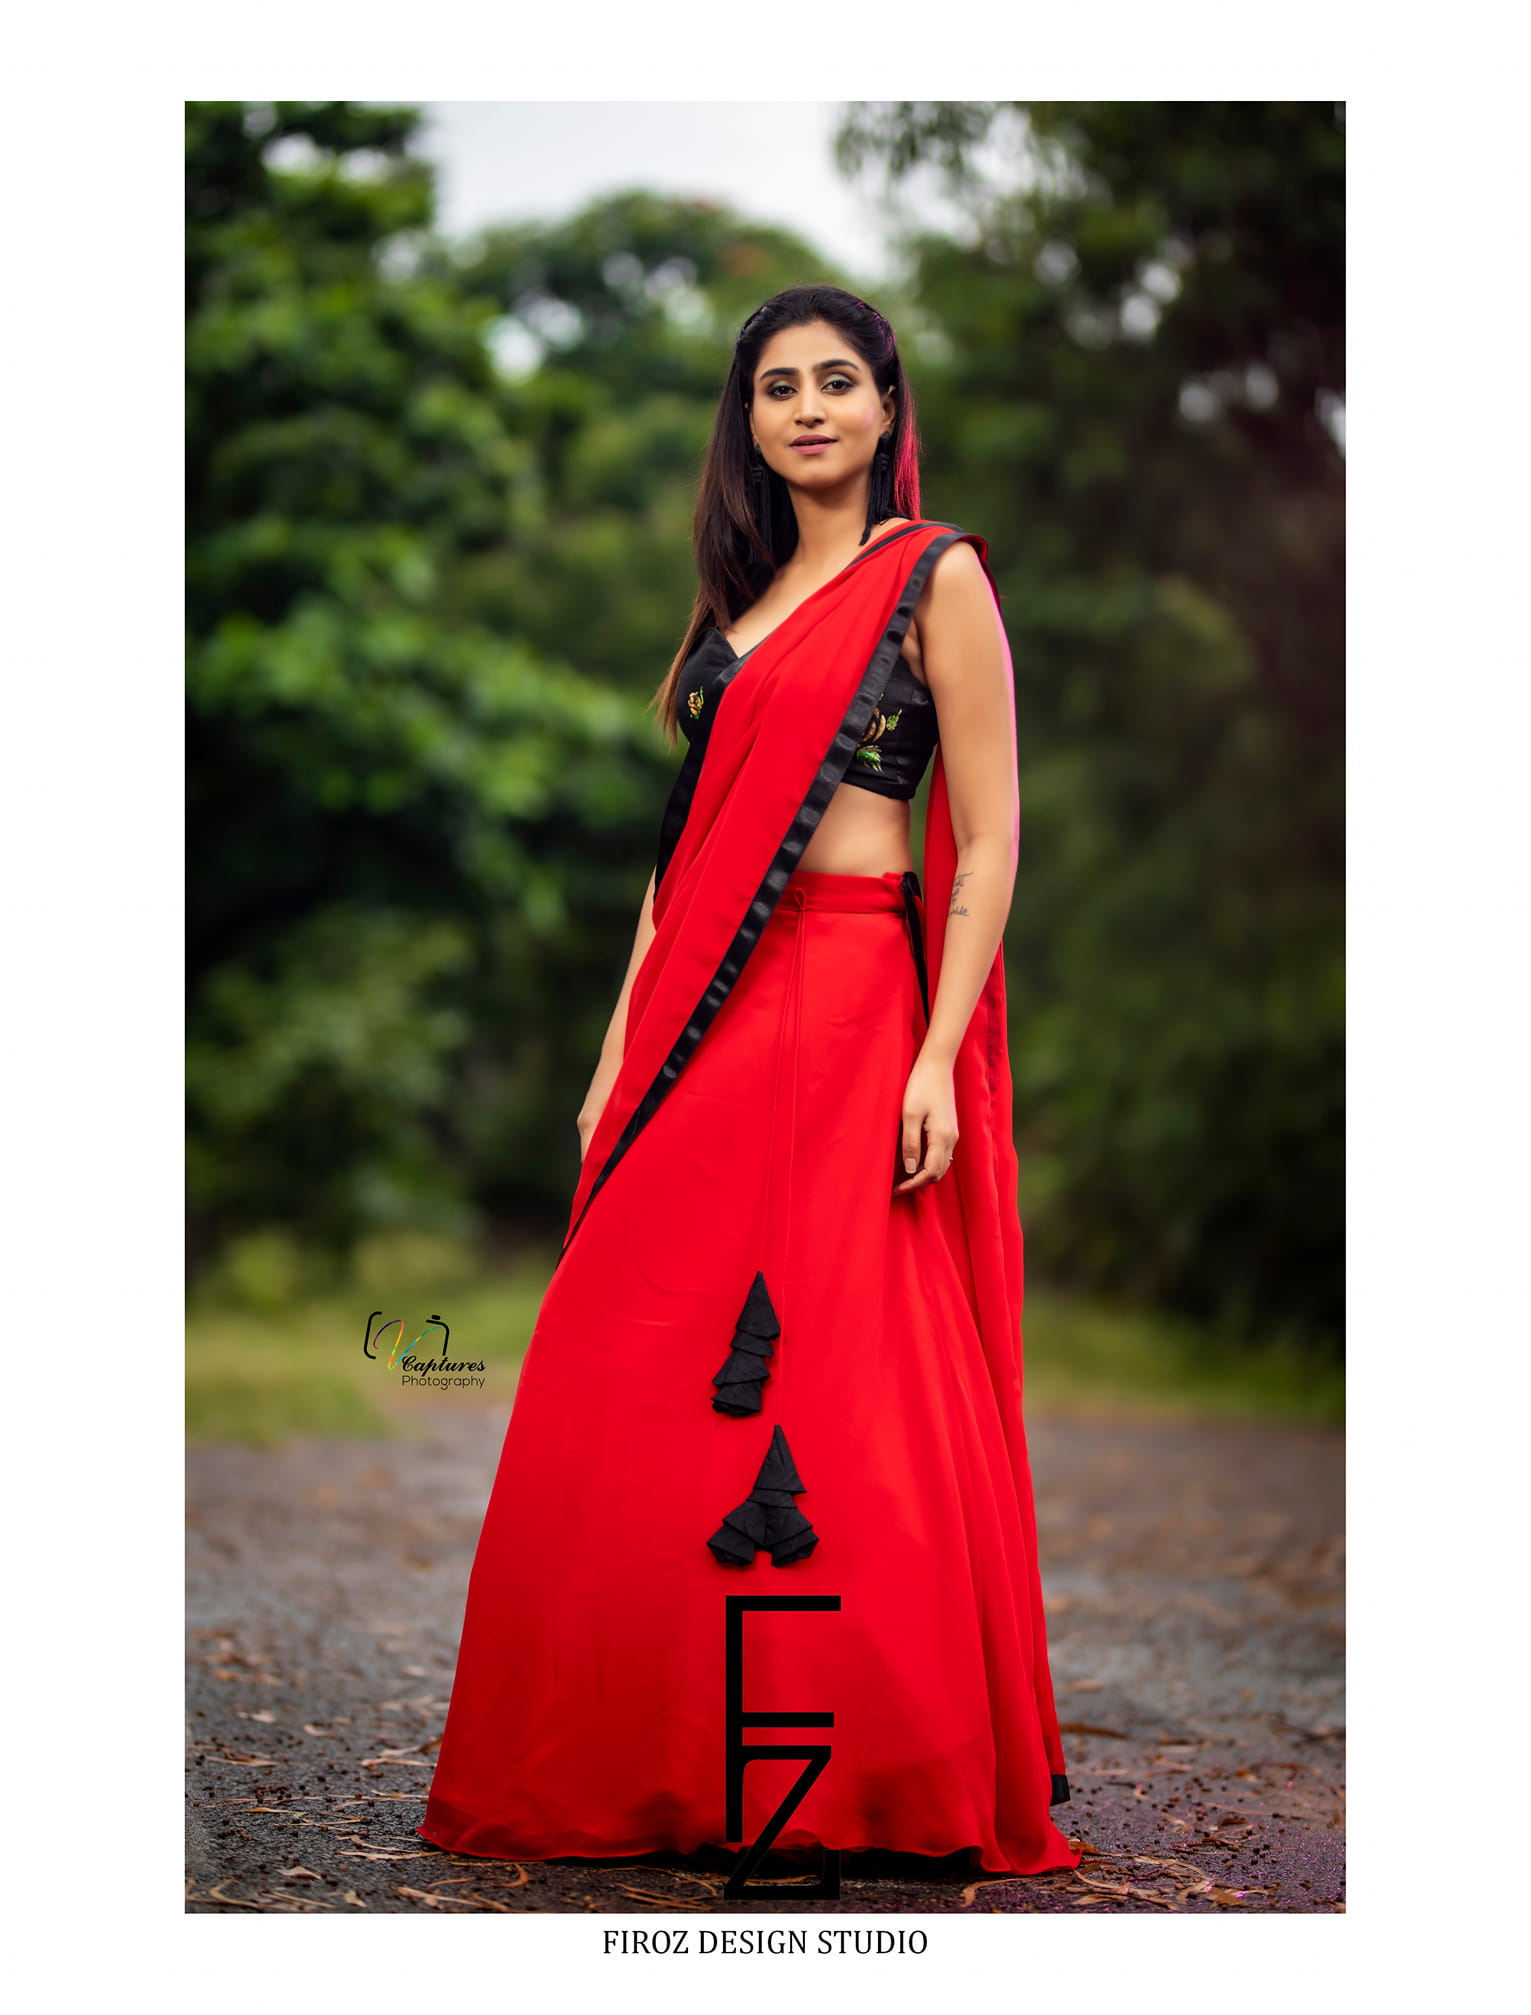 Glamorous Goddess Varshini looked beautiful in Firoz Design Studio  Firoz Design Studio outfit.  | shaadi lehenga | pattu lehenga | lacha blouse | 2020-11-08